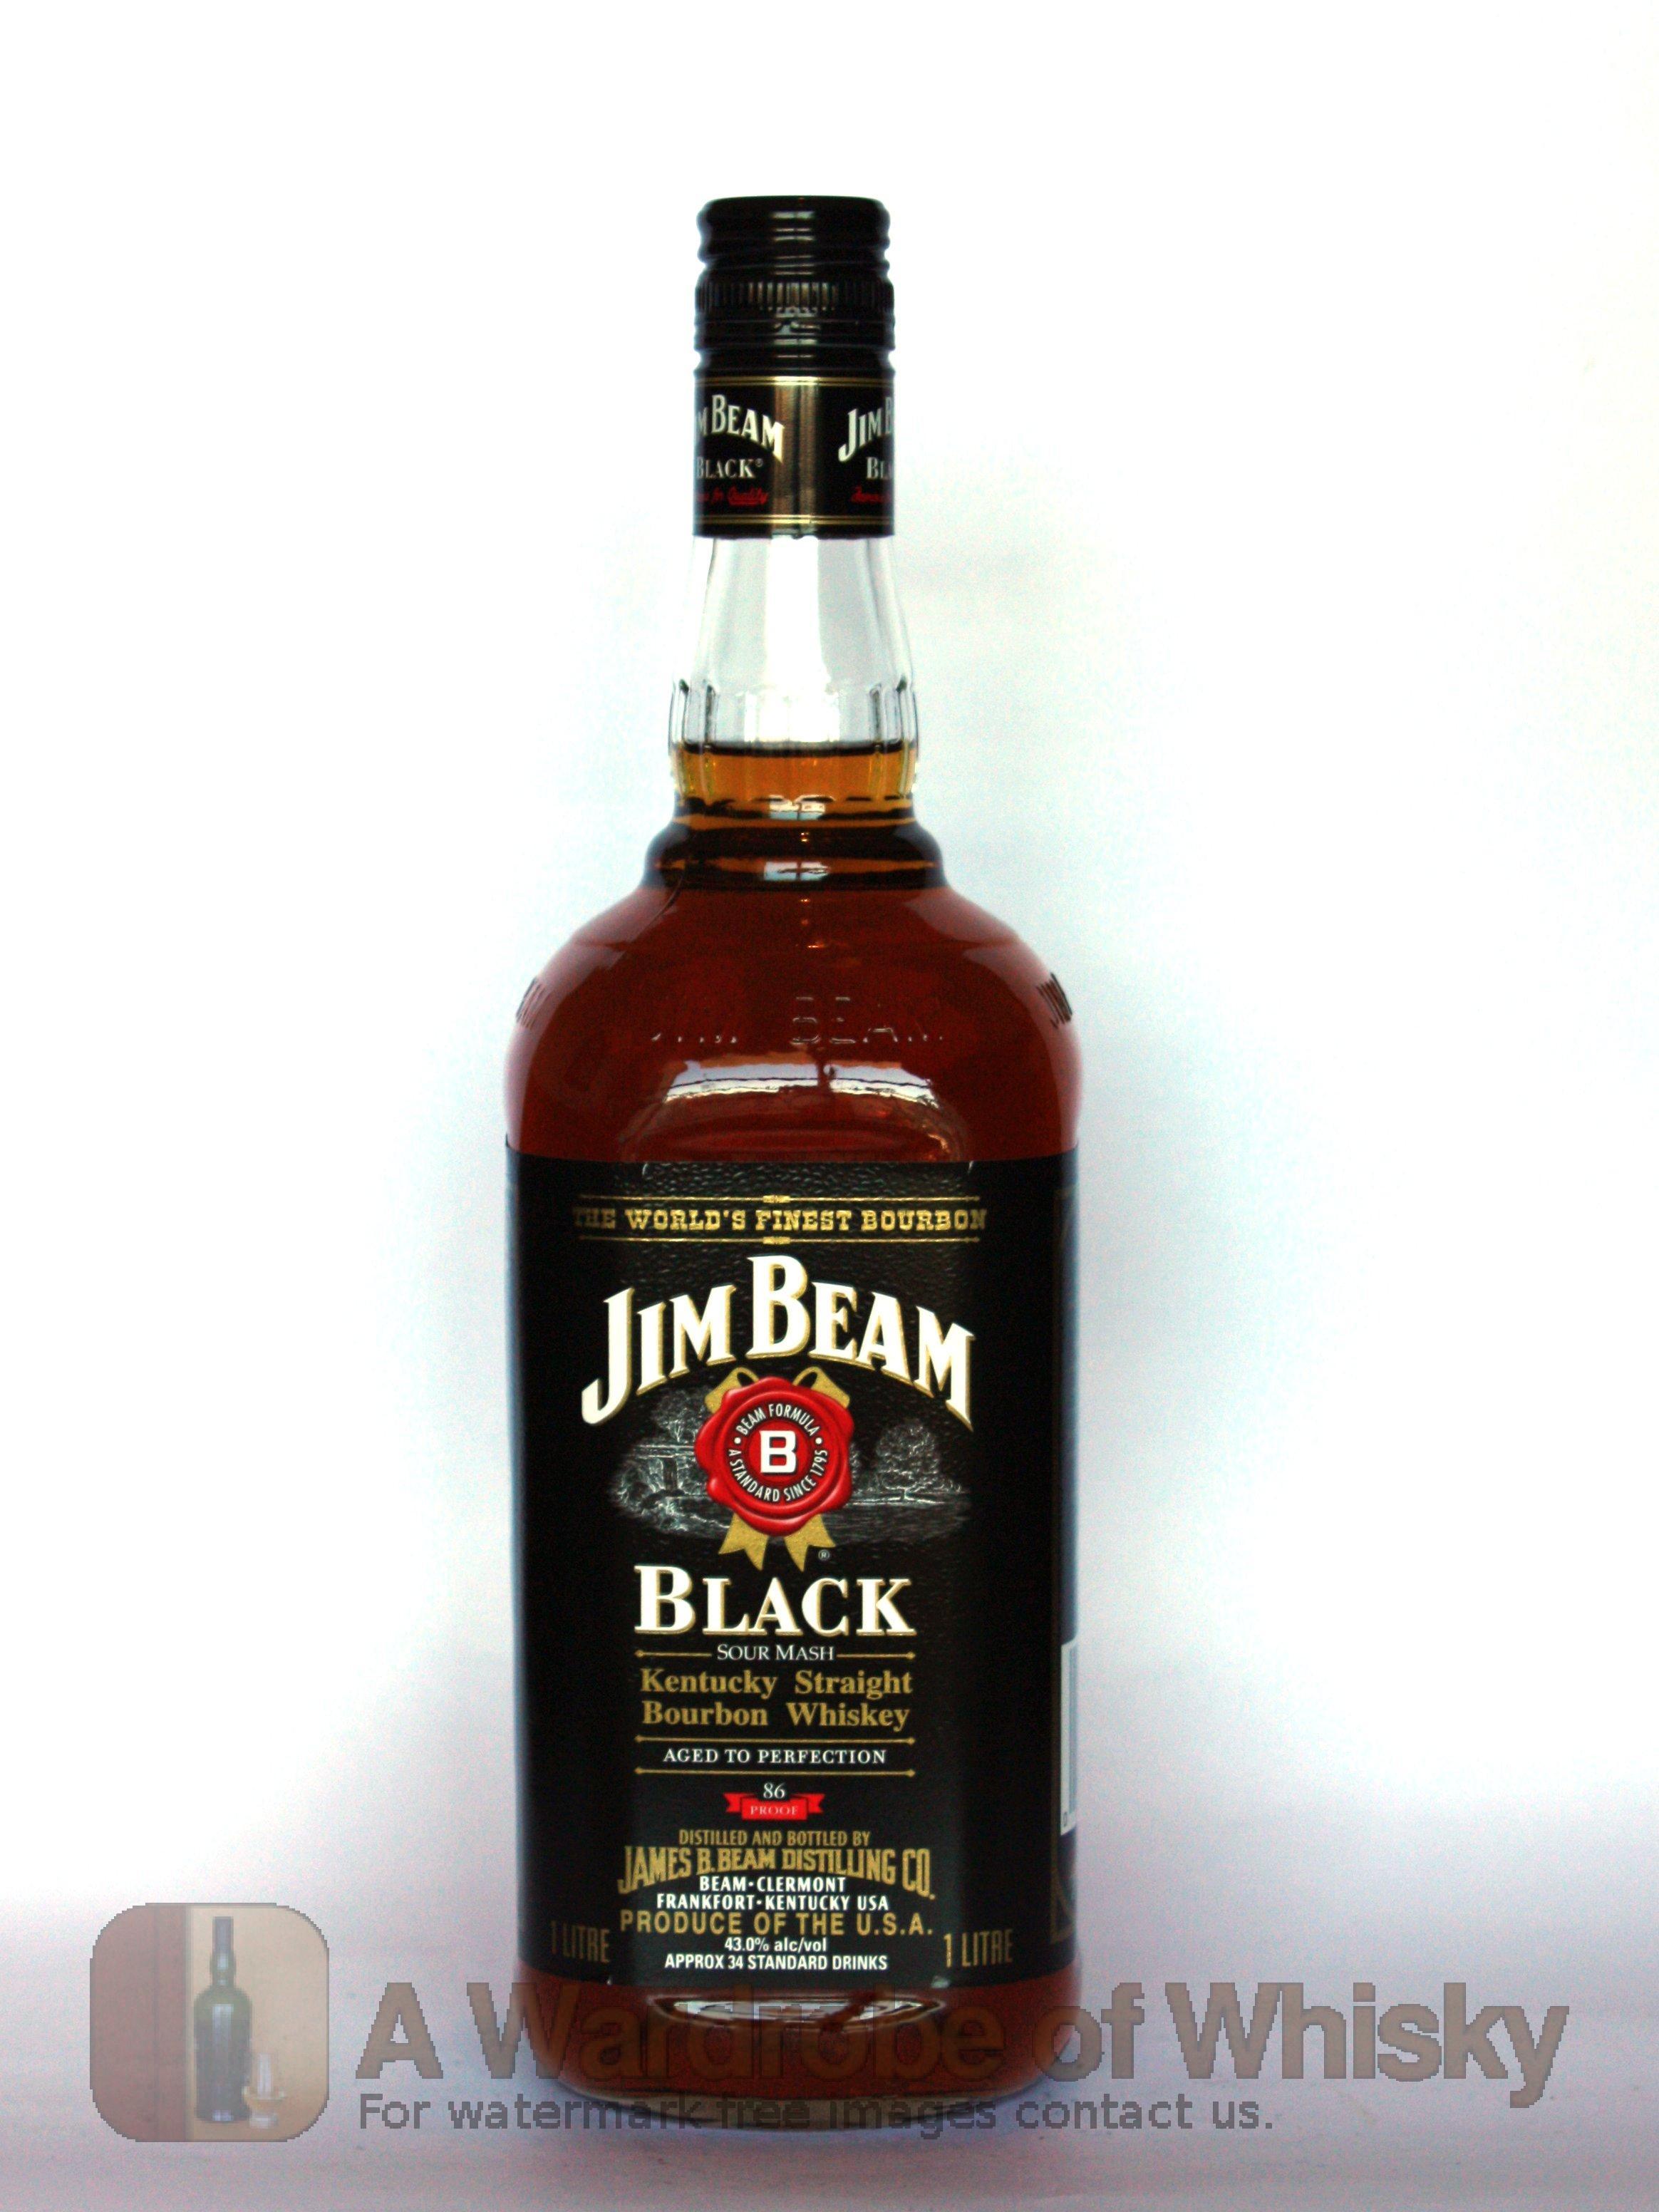 Buy Jim Beam Black Bourbon Jim Beam Whisky Ratings